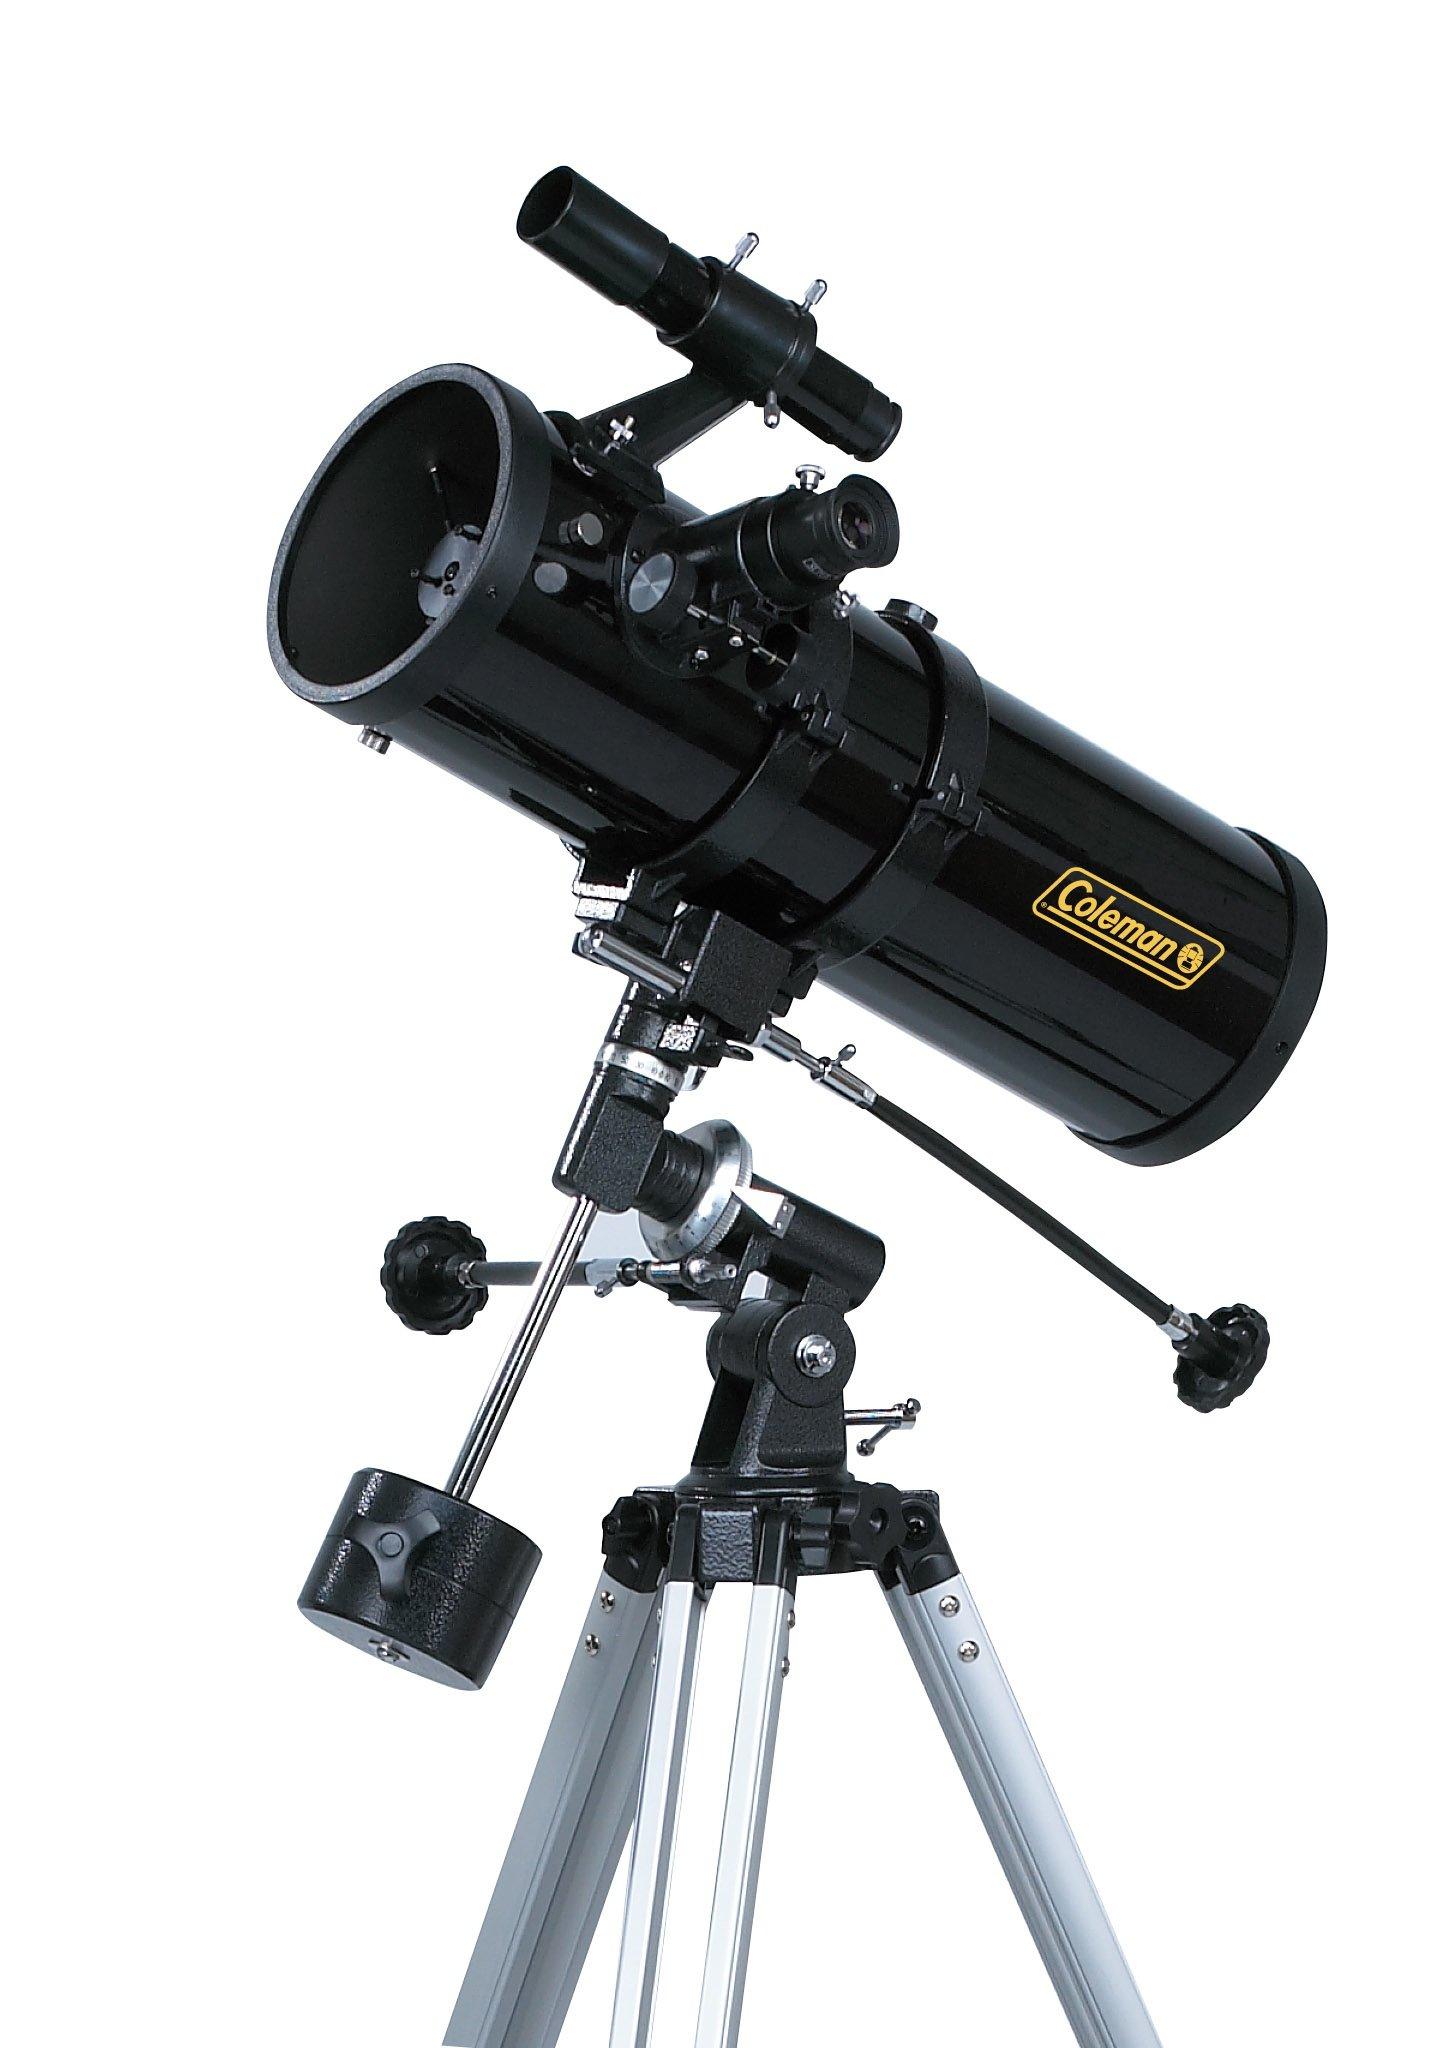 Coleman CDB1145EQ1 500x114 Telescope by Coleman